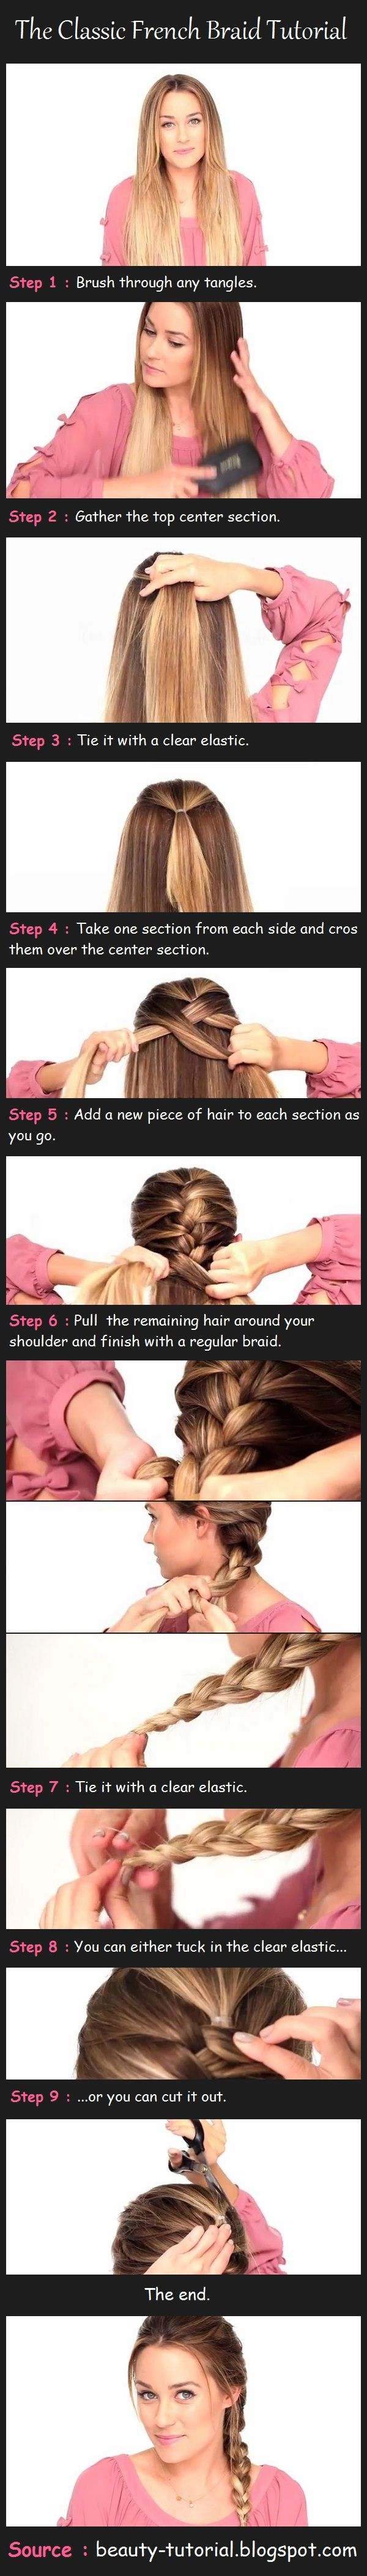 100s of Hair tutorials @stephanie cosgrove